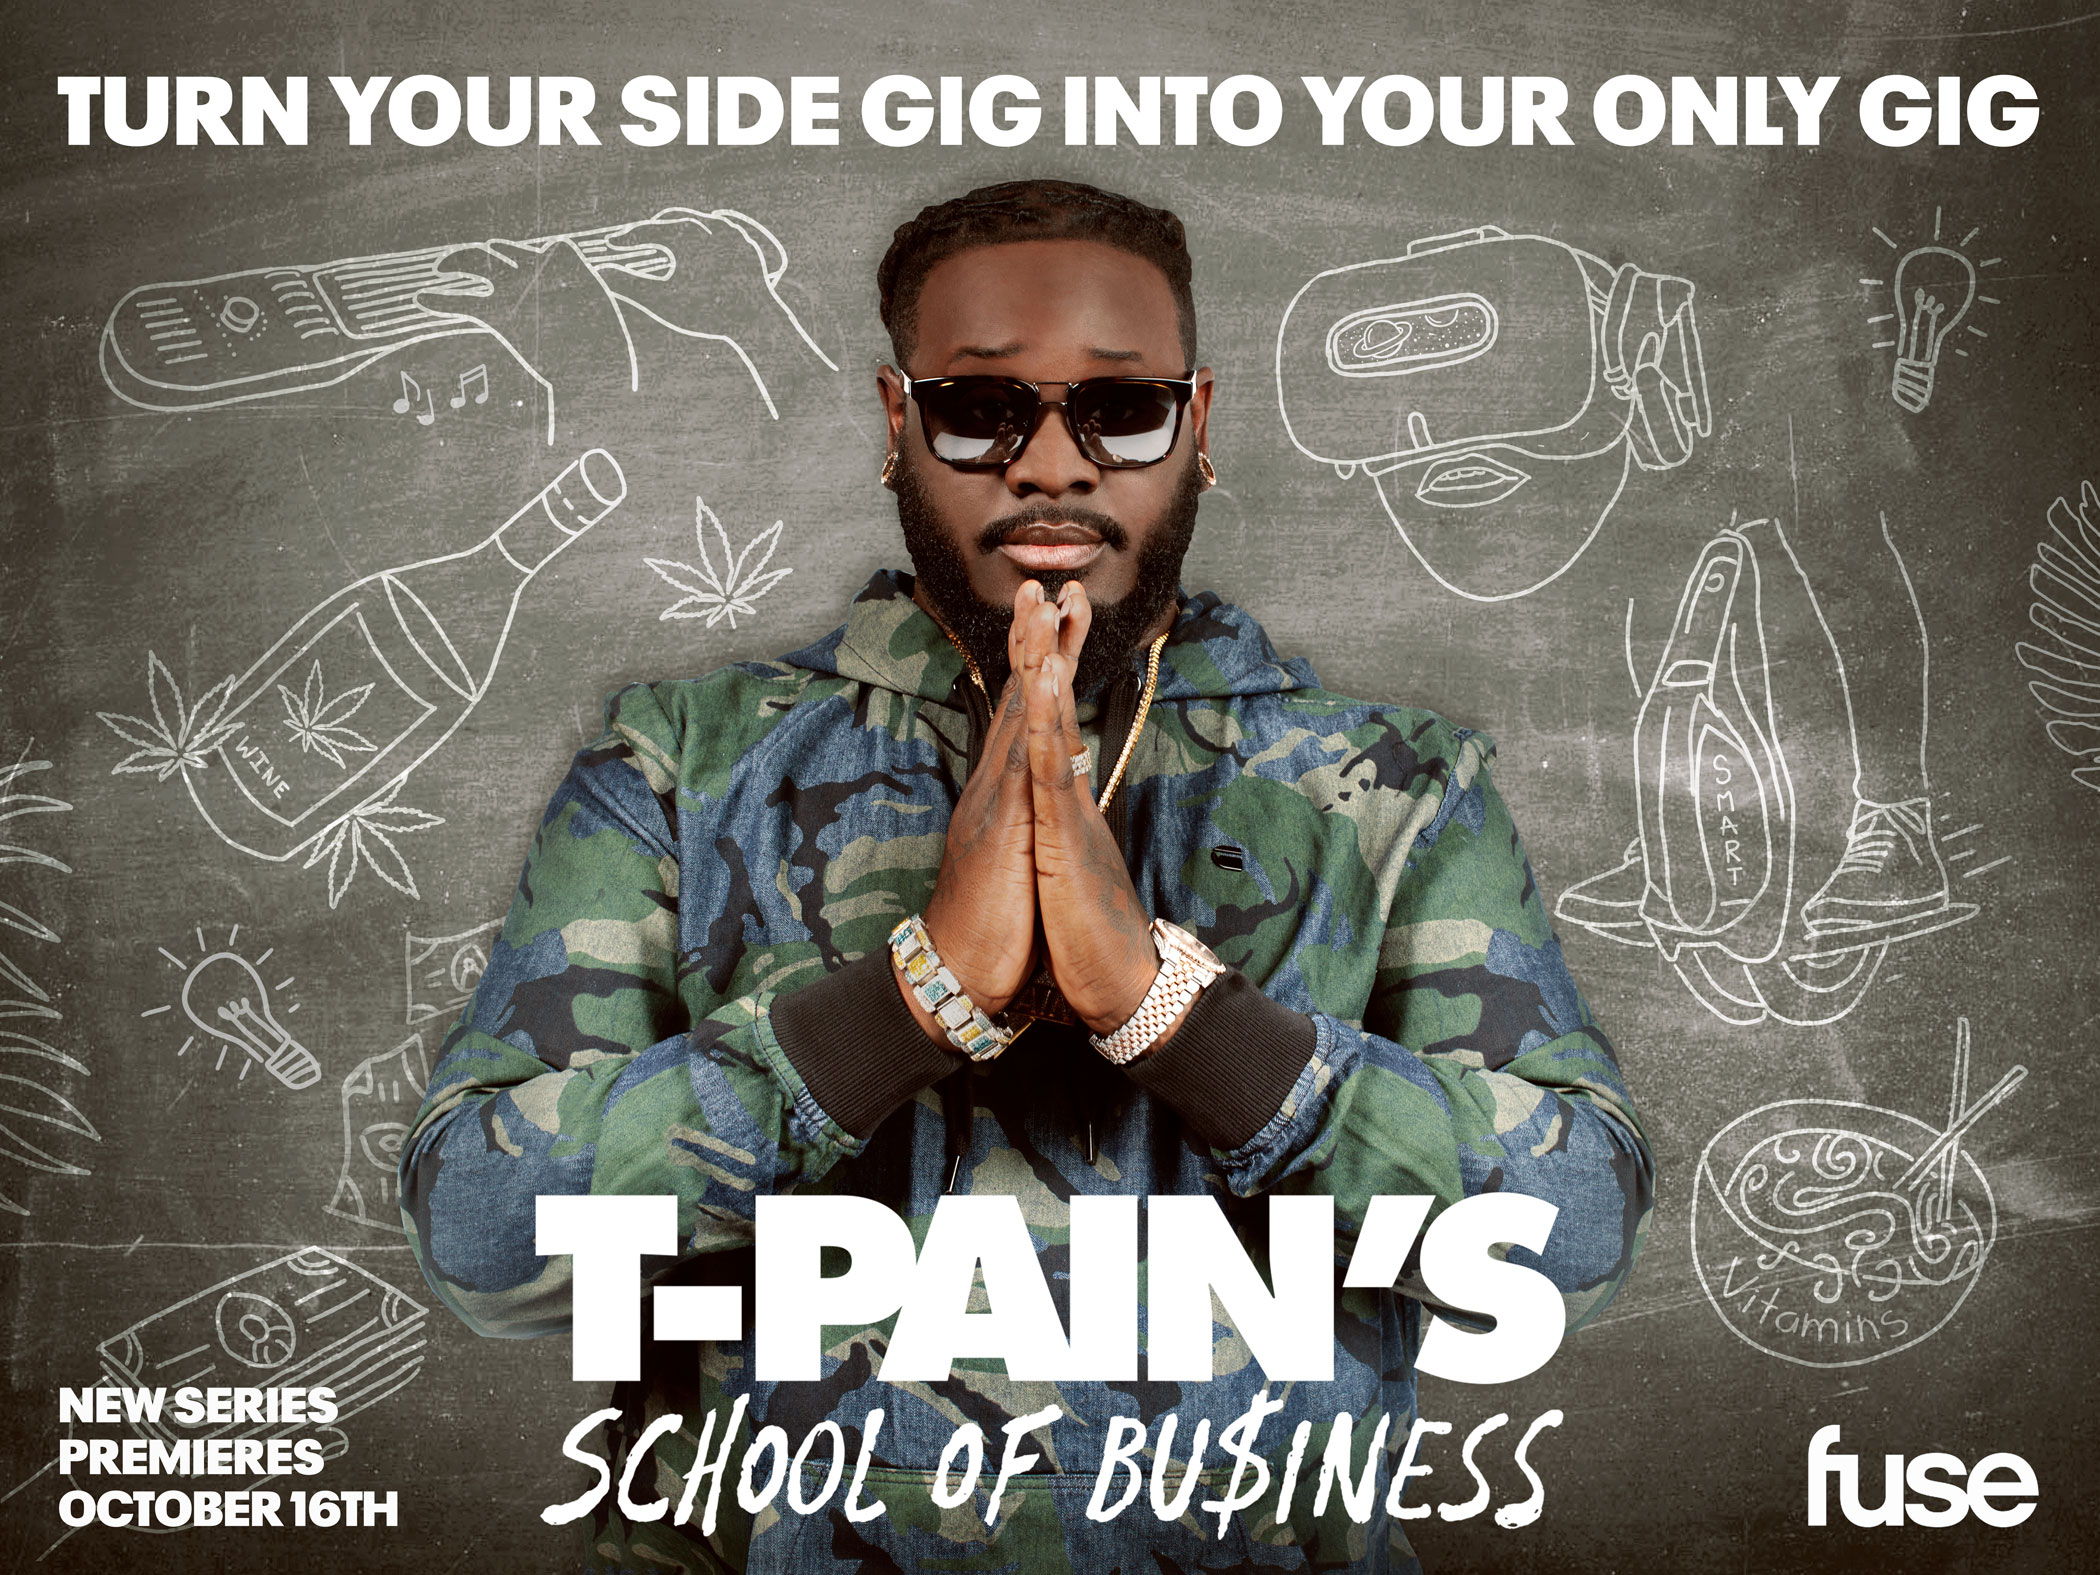 T-PAIN'S SCHOOL OF BUSINESS SHOW KEY ART DESIGN